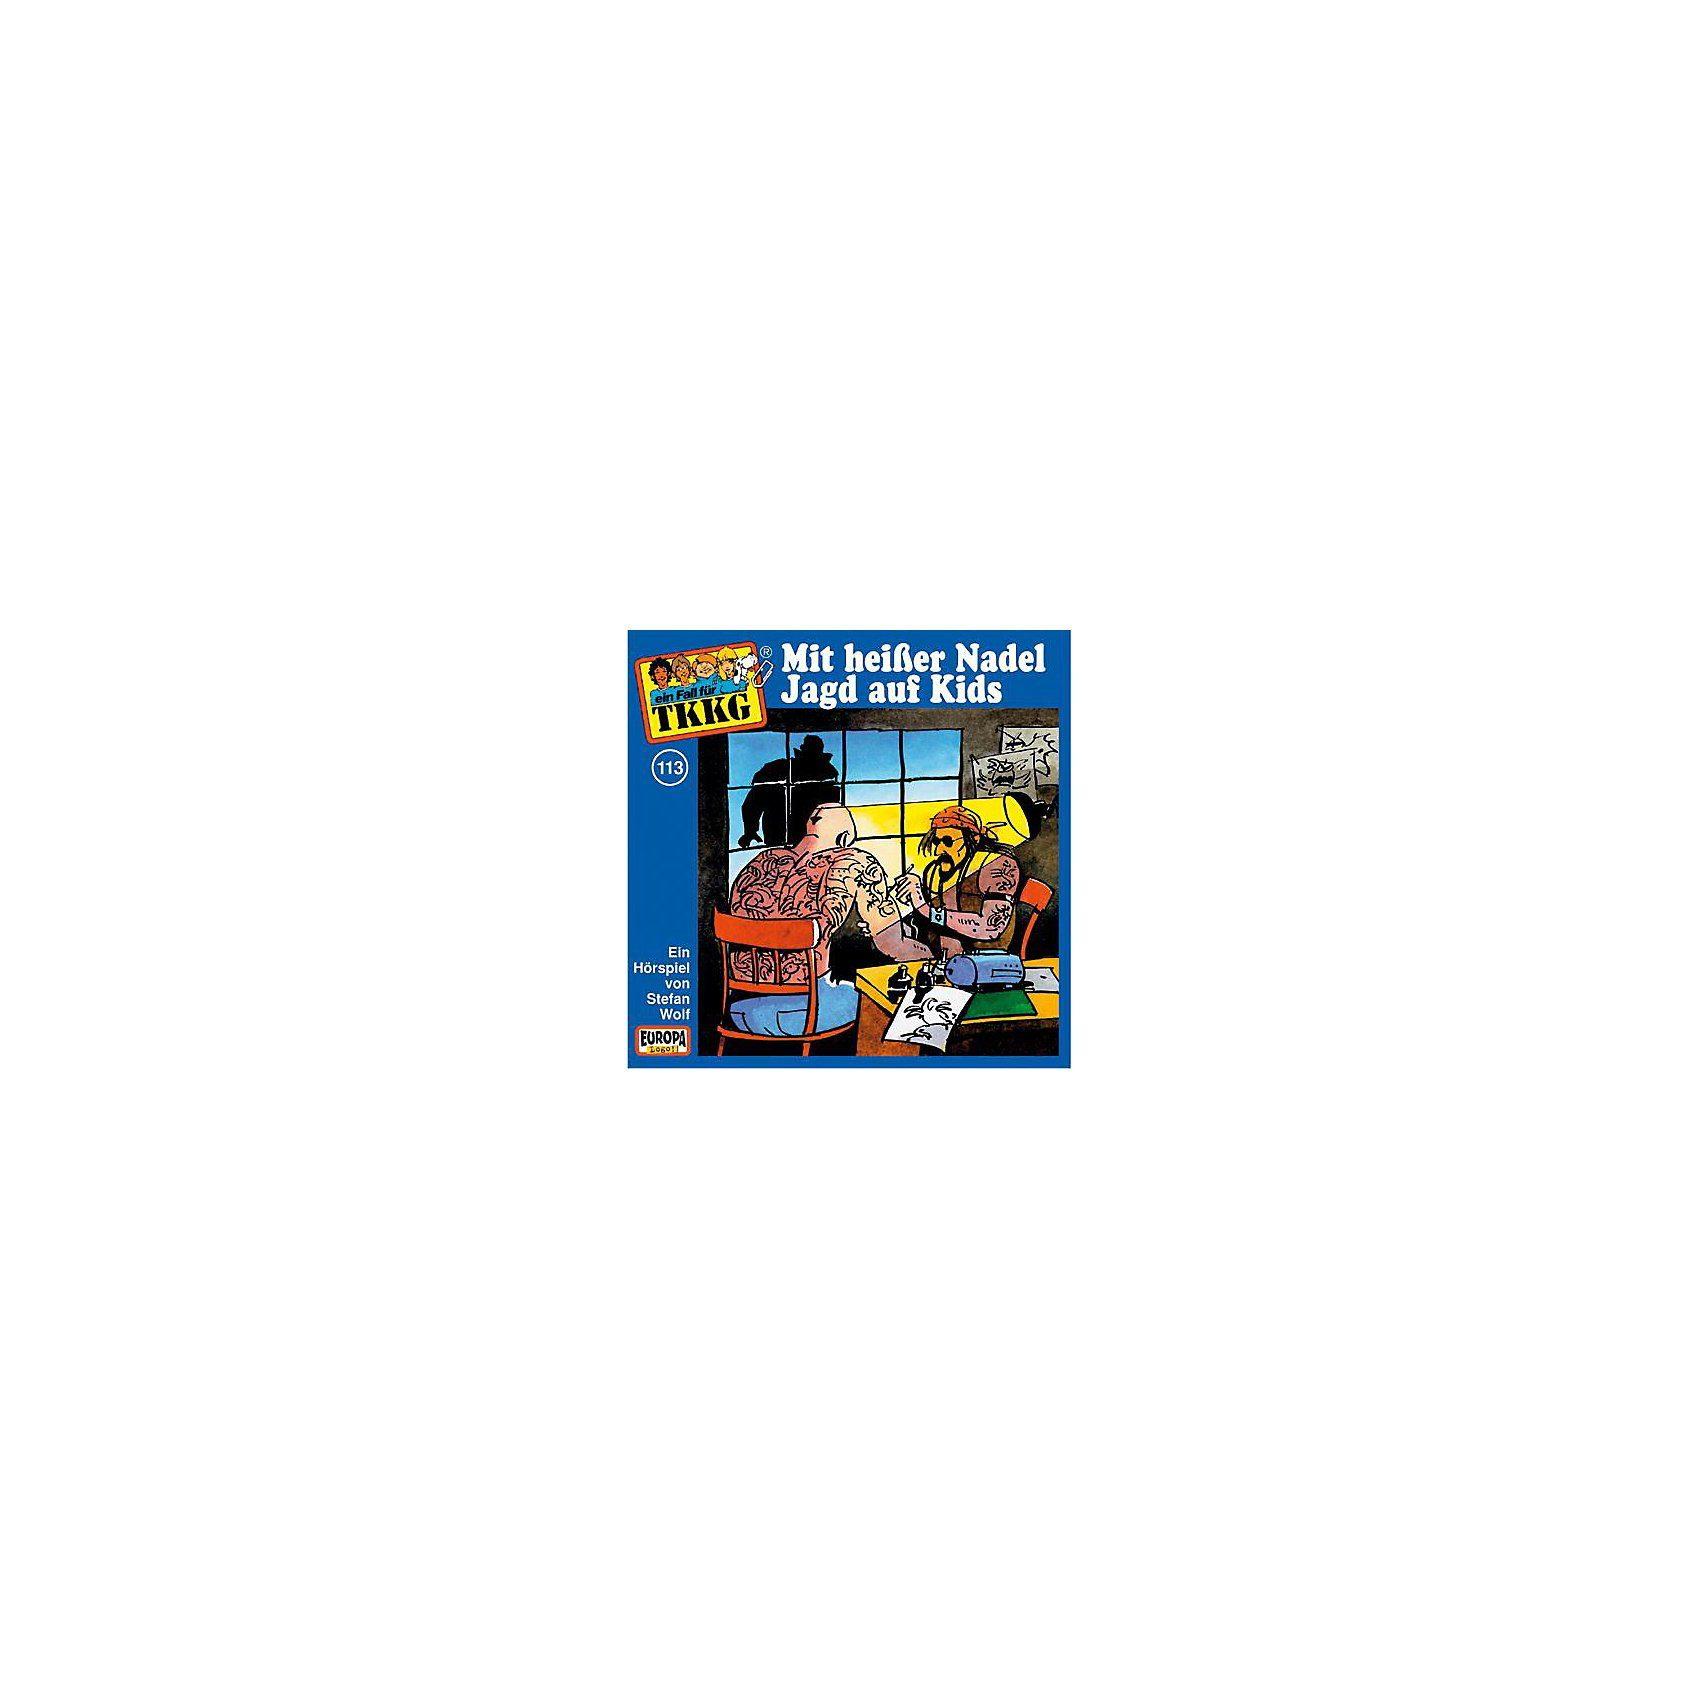 Sony CD TKKG 113 - Mit heißer Nadel Jagd auf Kids